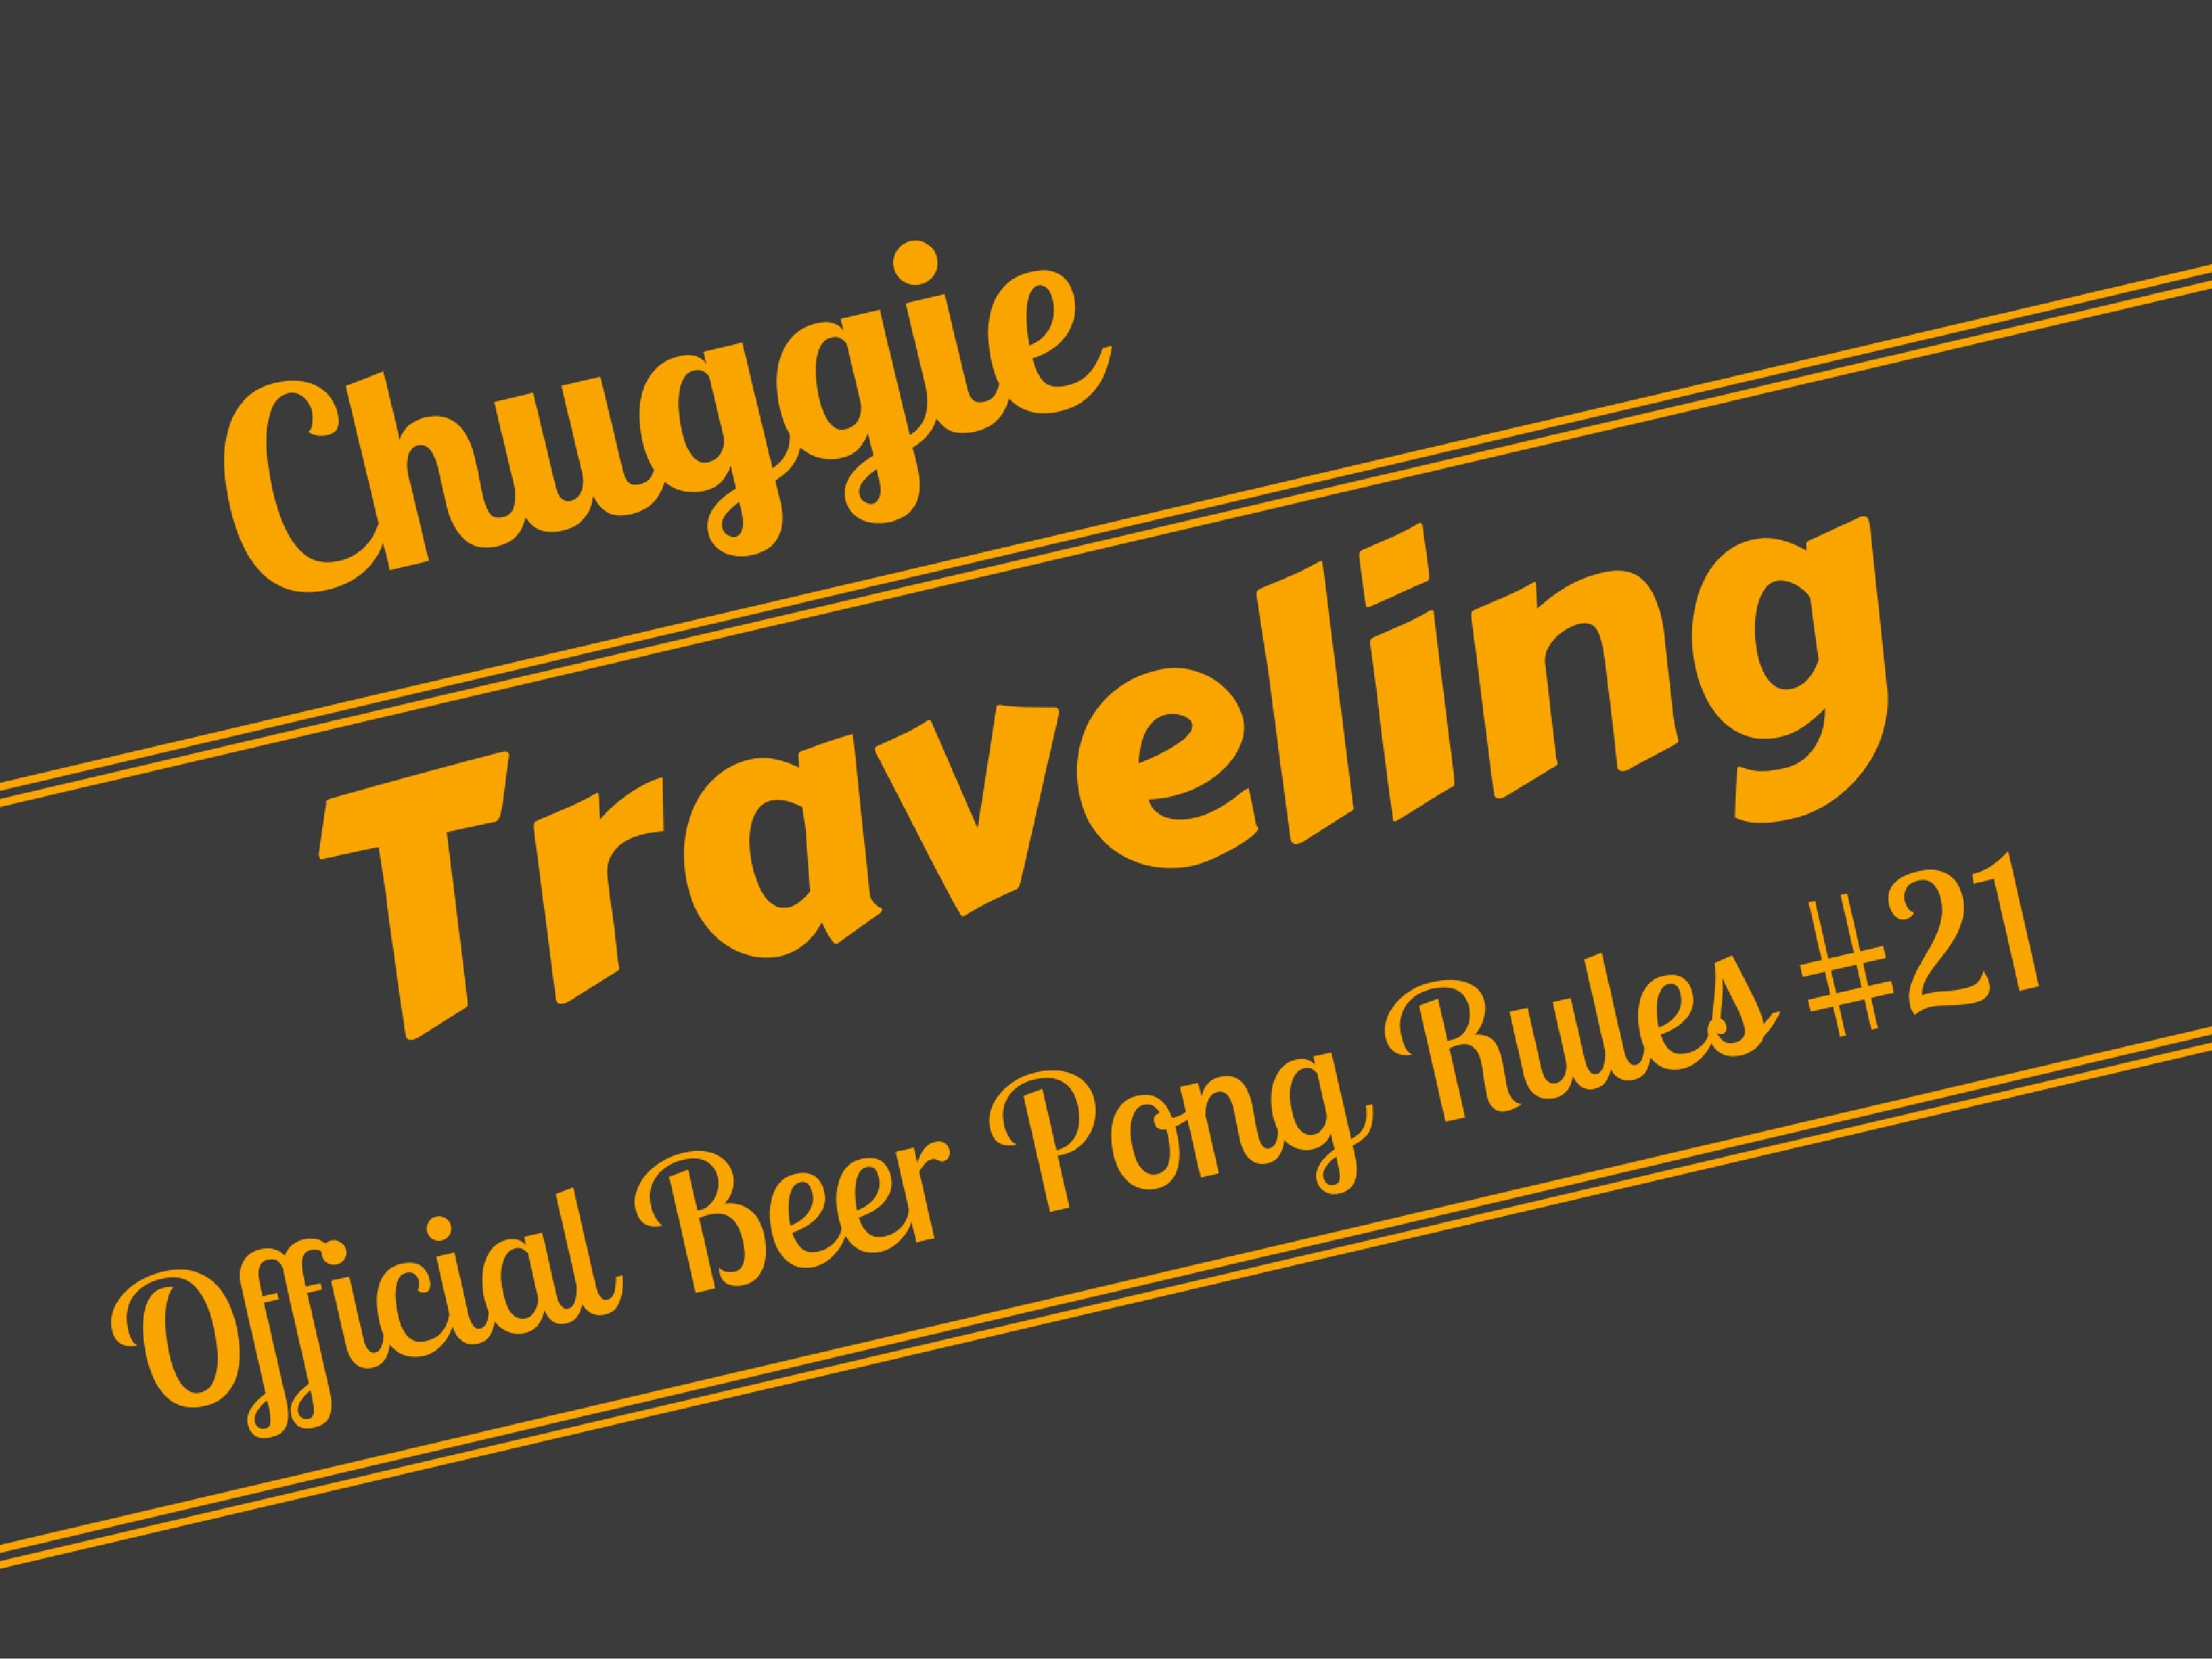 Traveling Beer Pong Rule Official Beer Pong Rules 21 Chuggie